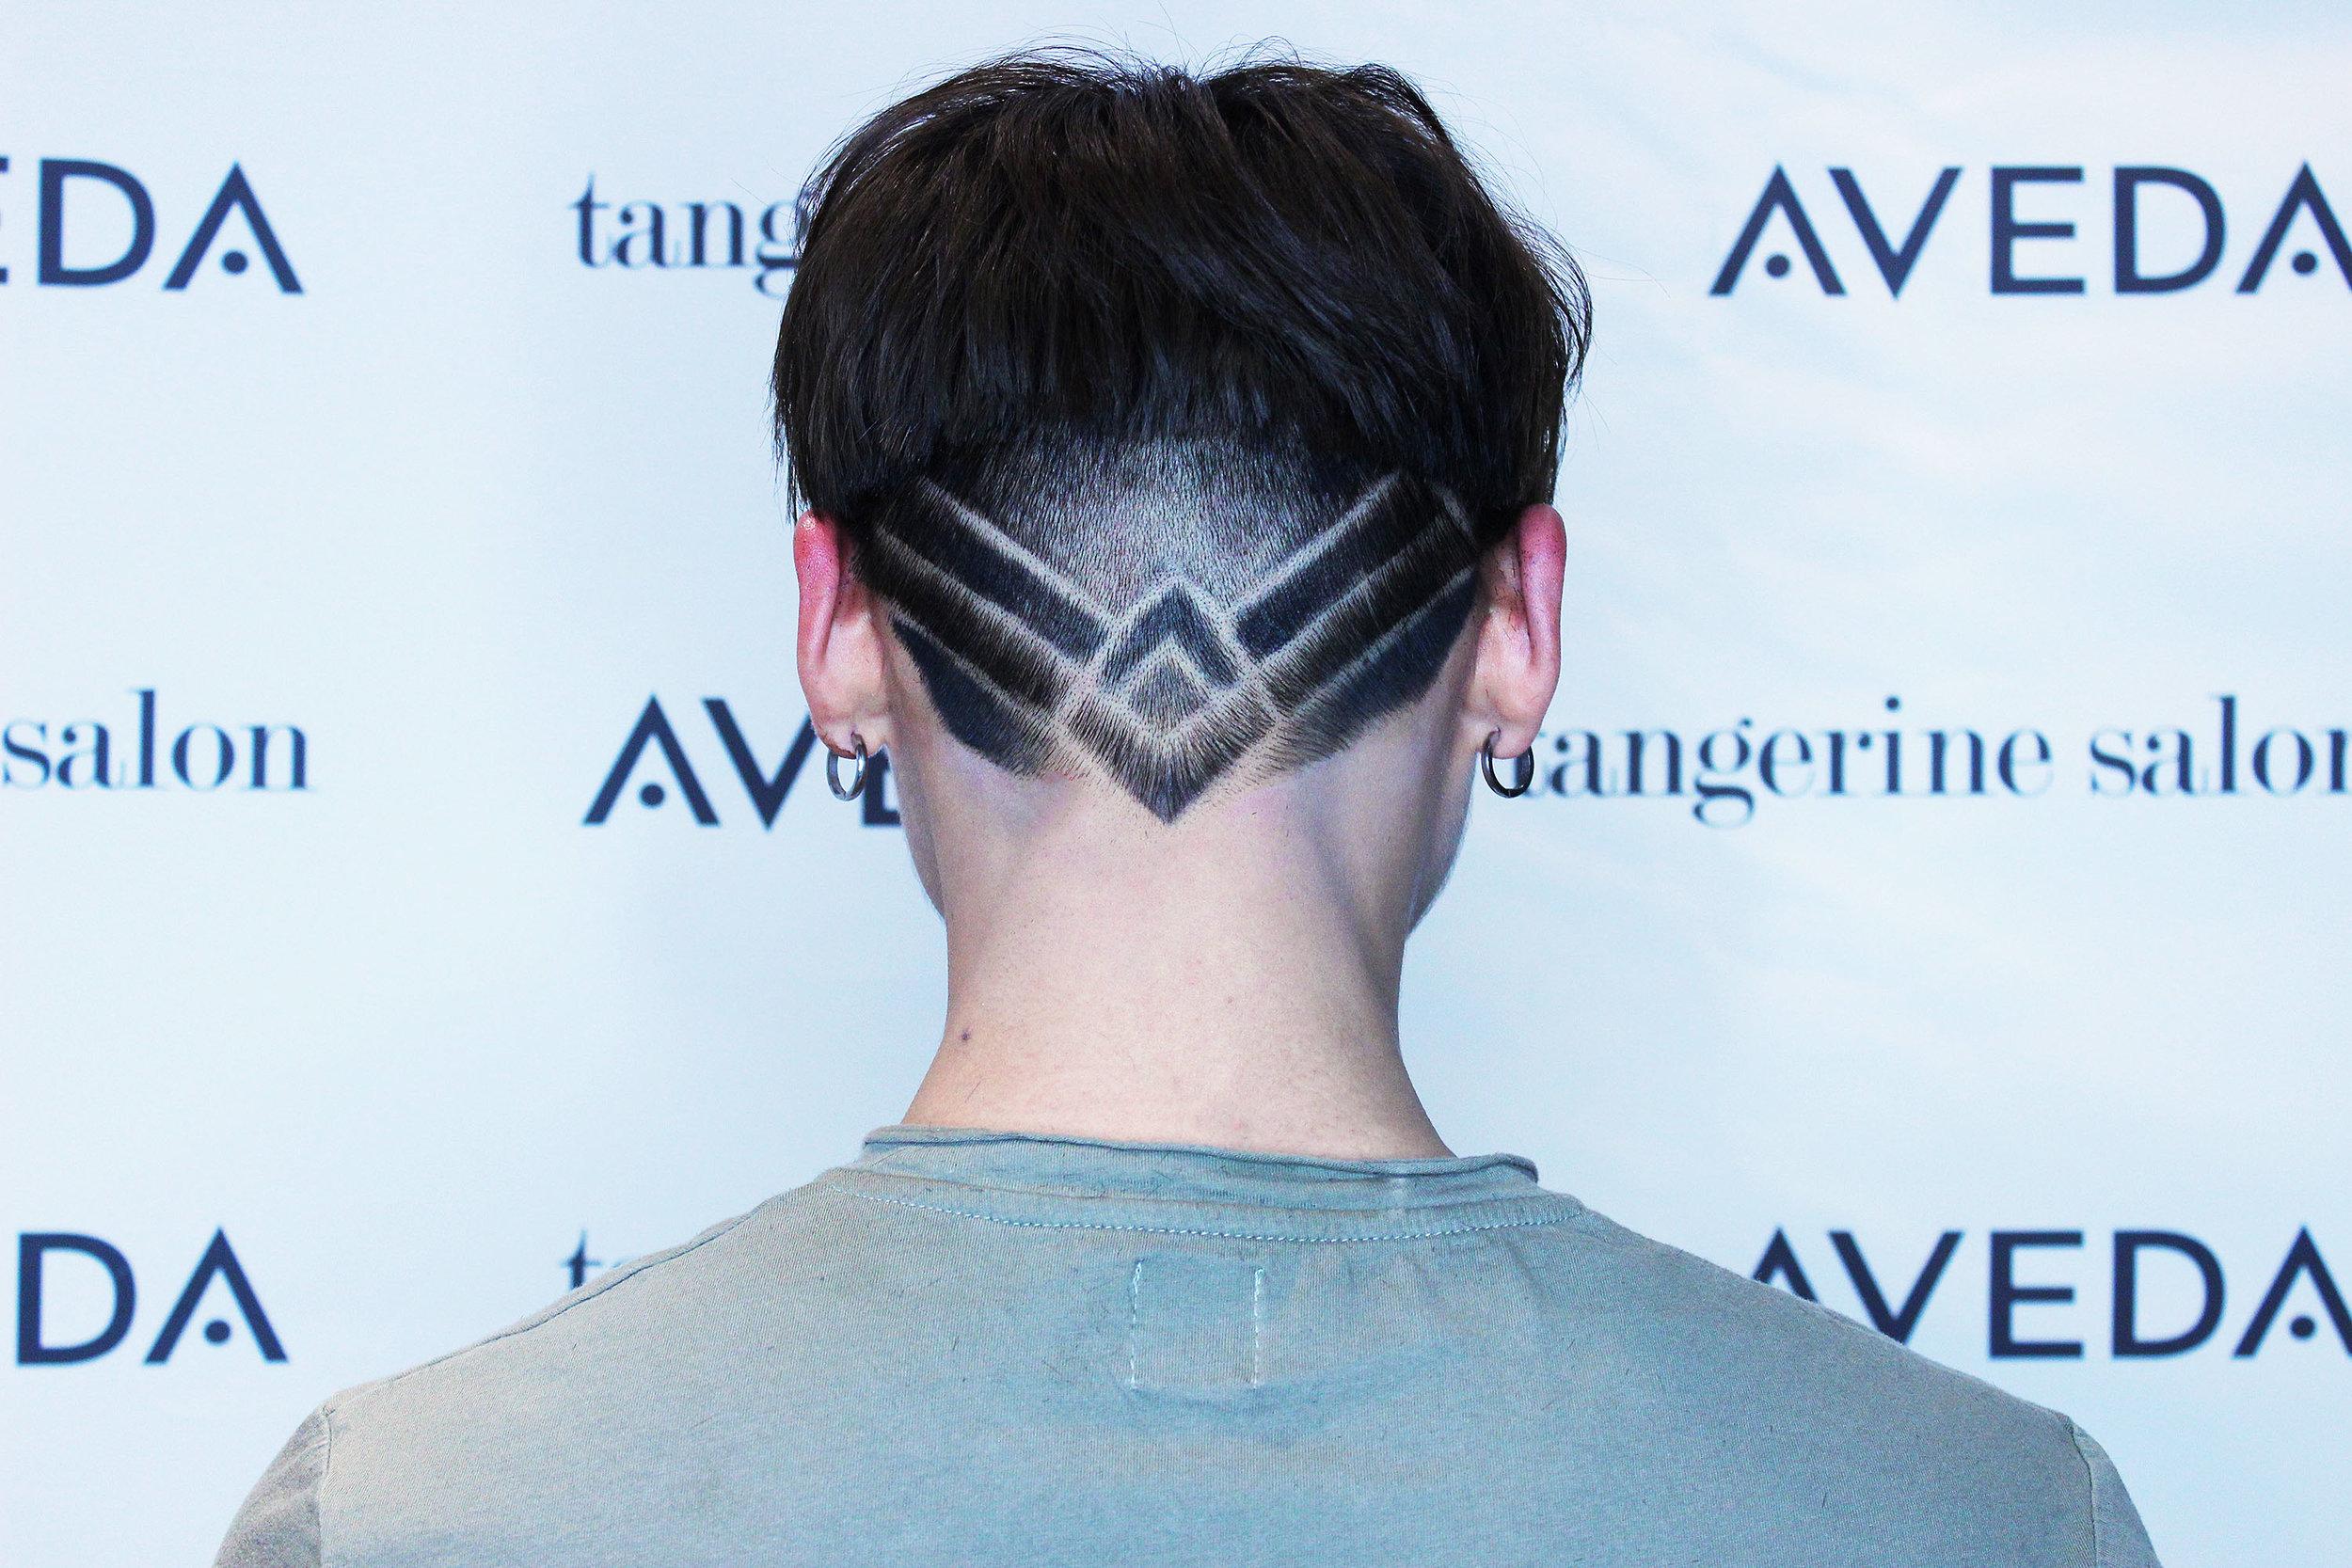 hair etching dallas.jpg